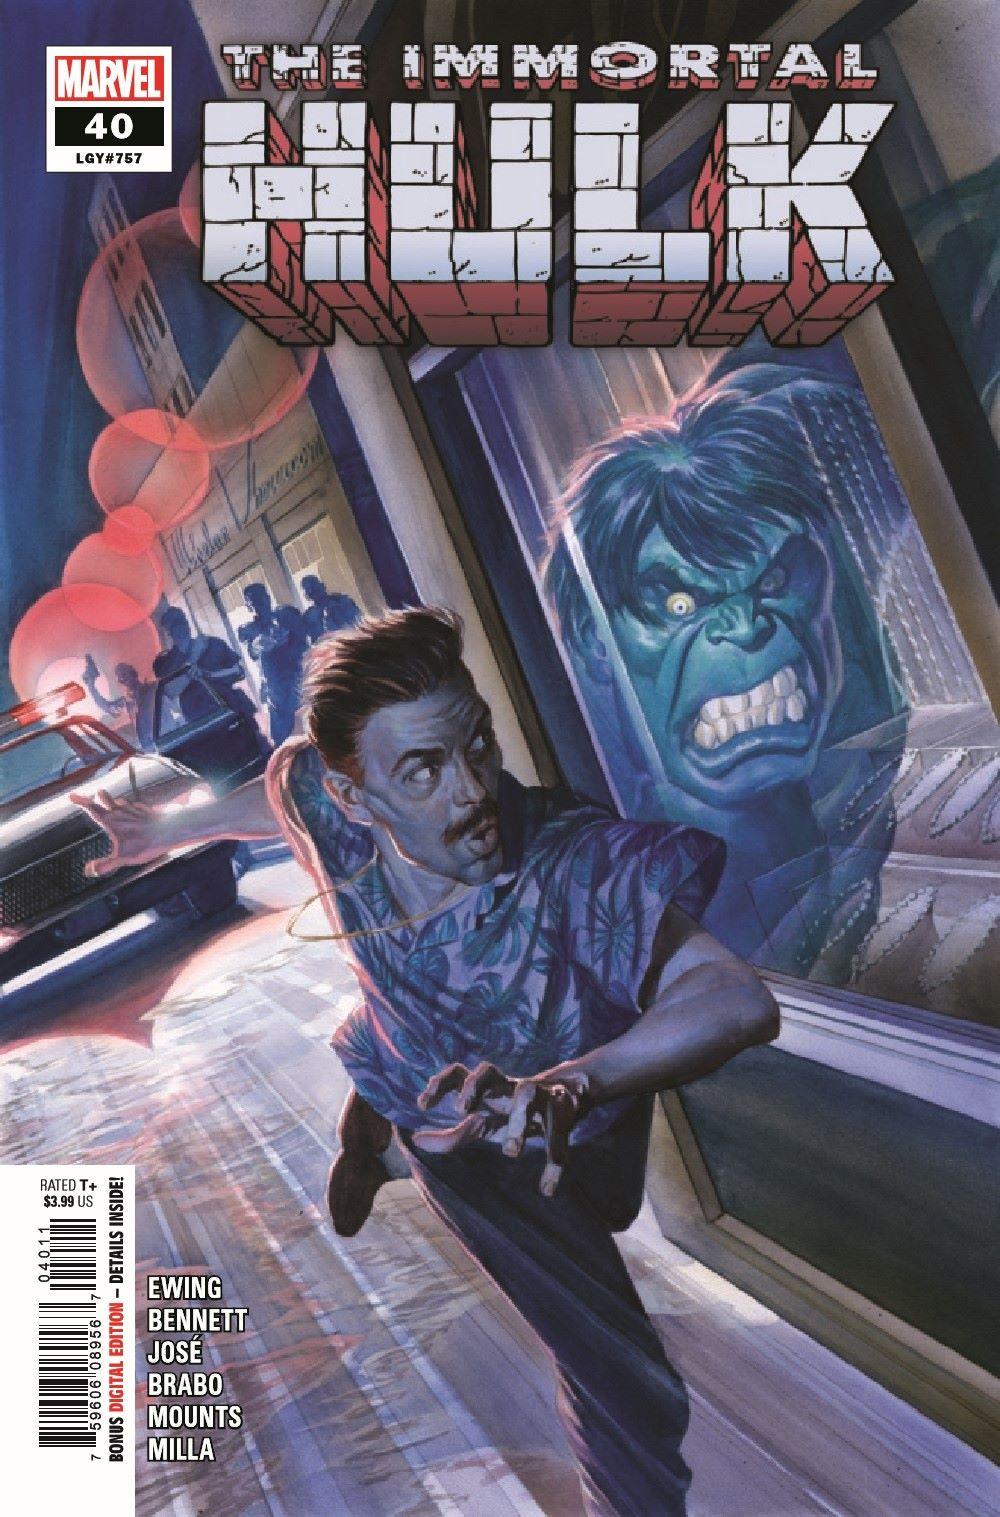 HULK2018040_Preview-1 ComicList Previews: IMMORTAL HULK #40